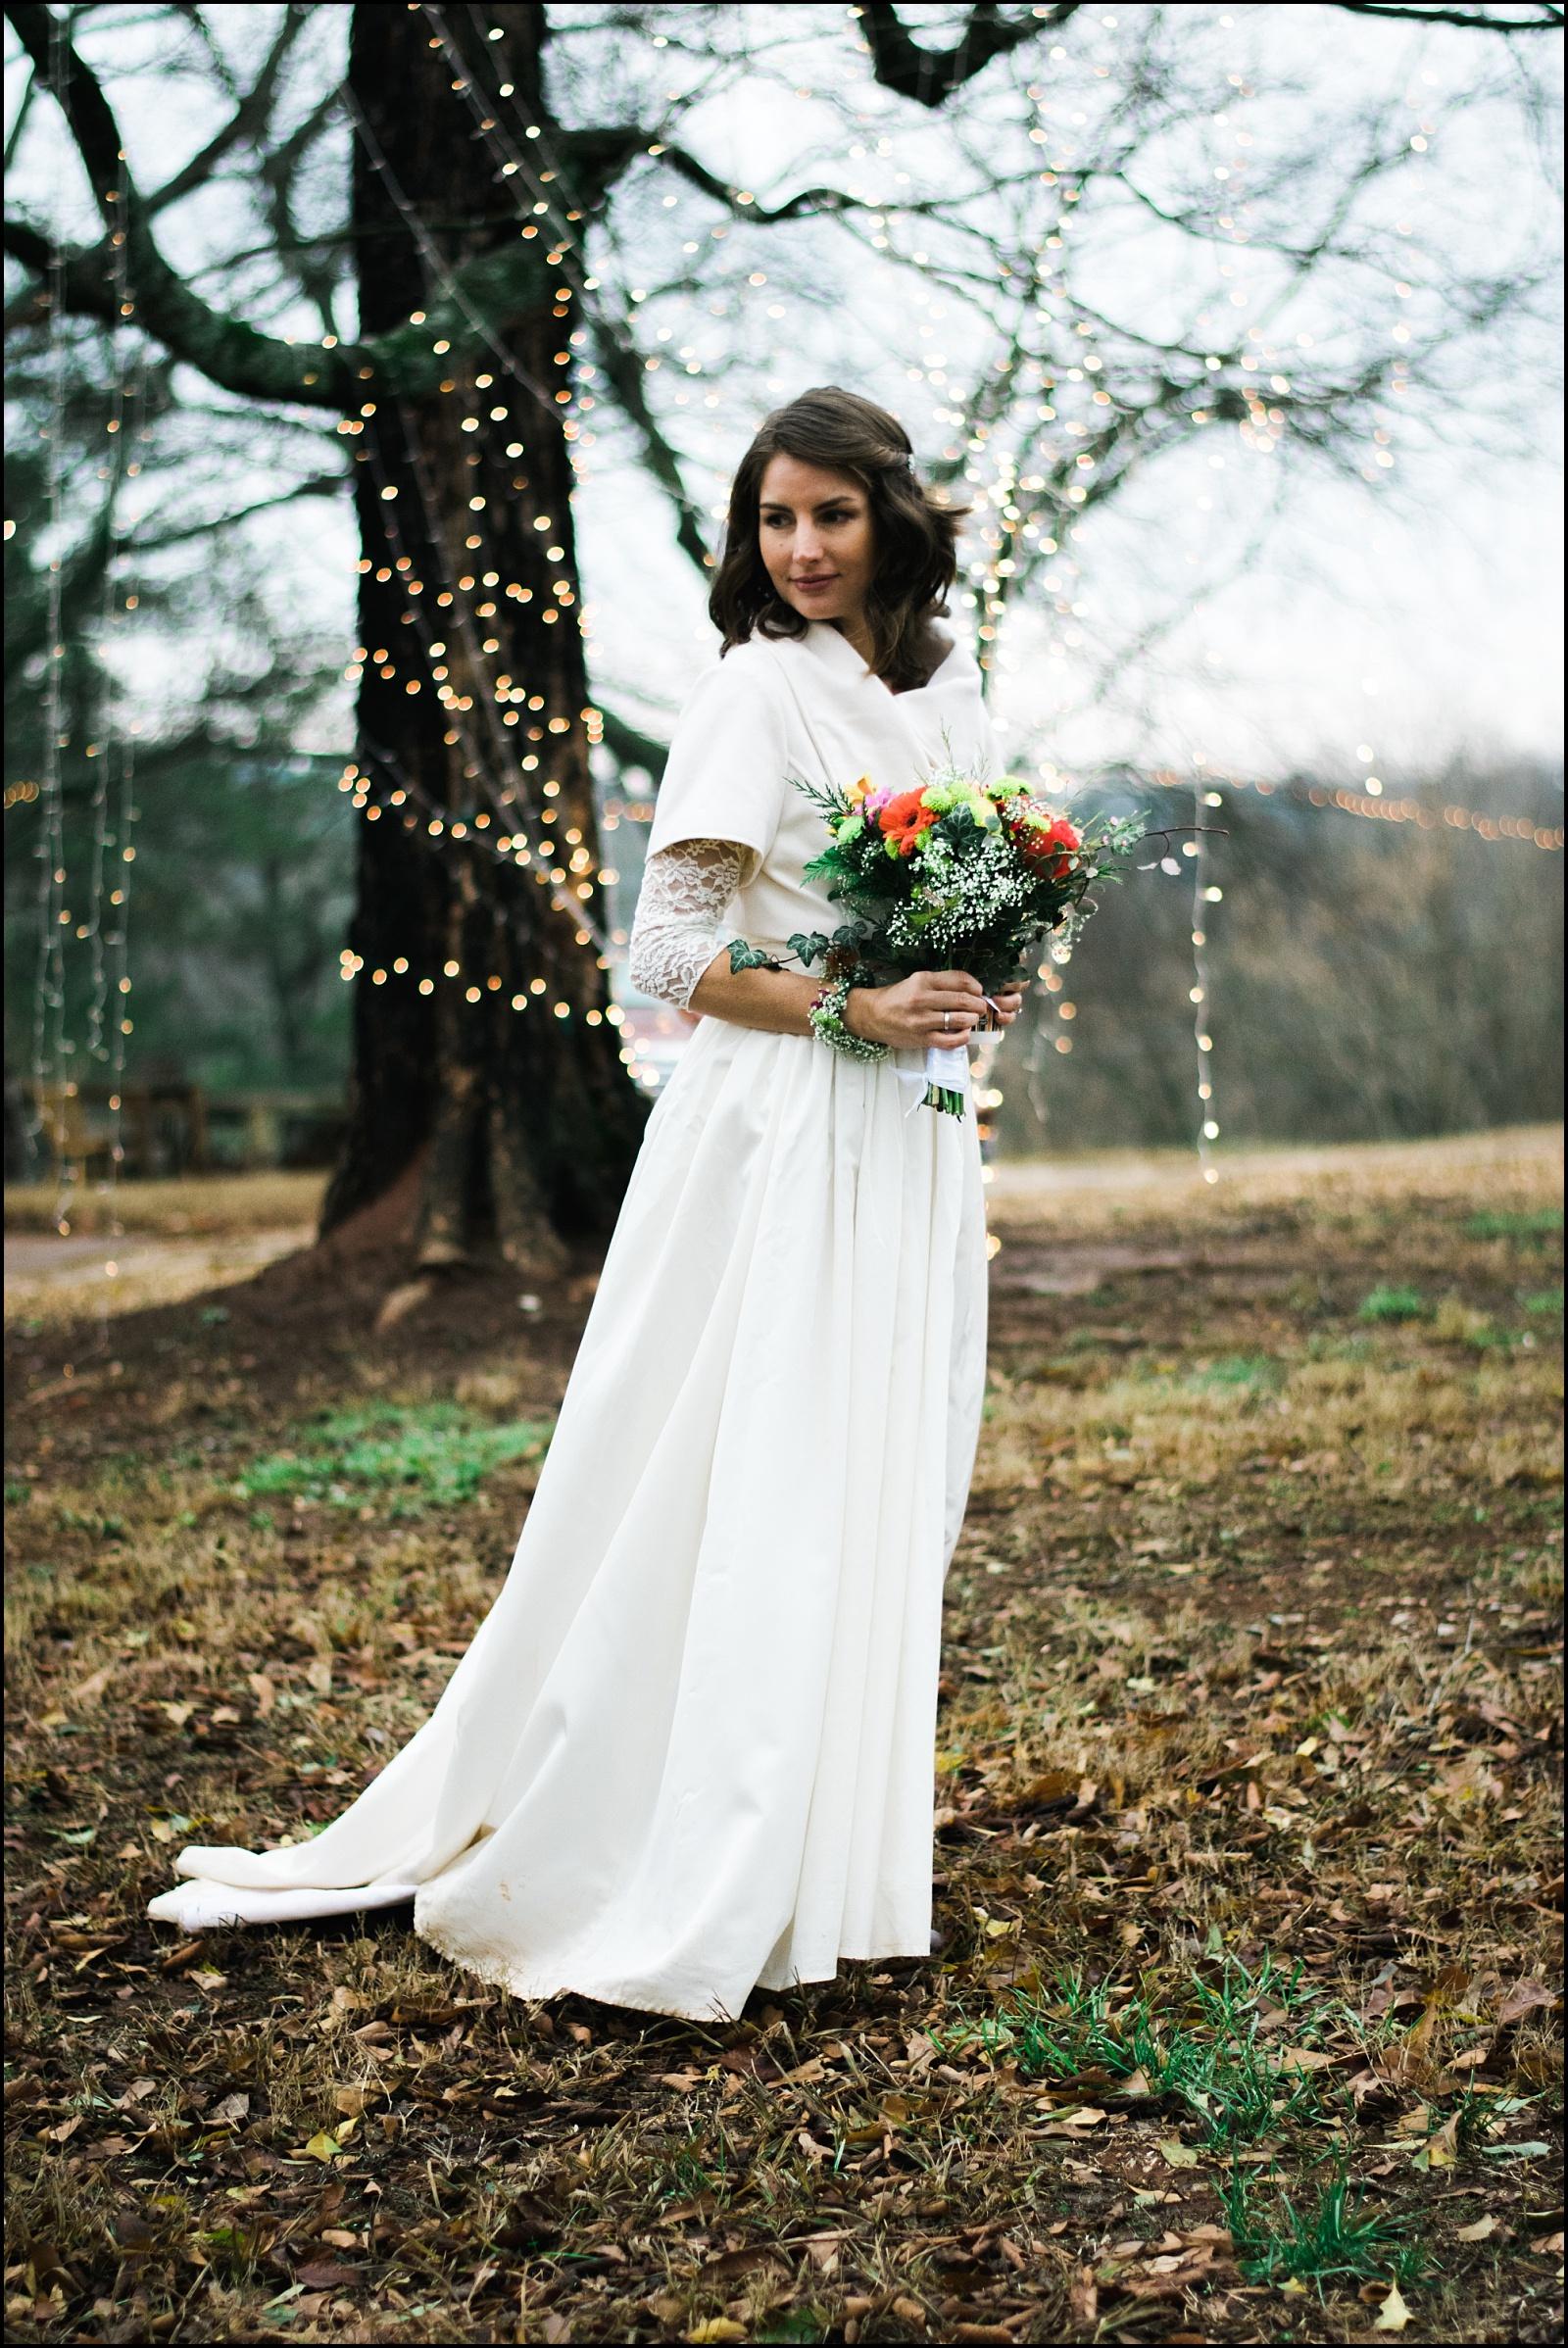 Bridal portrait after wedding